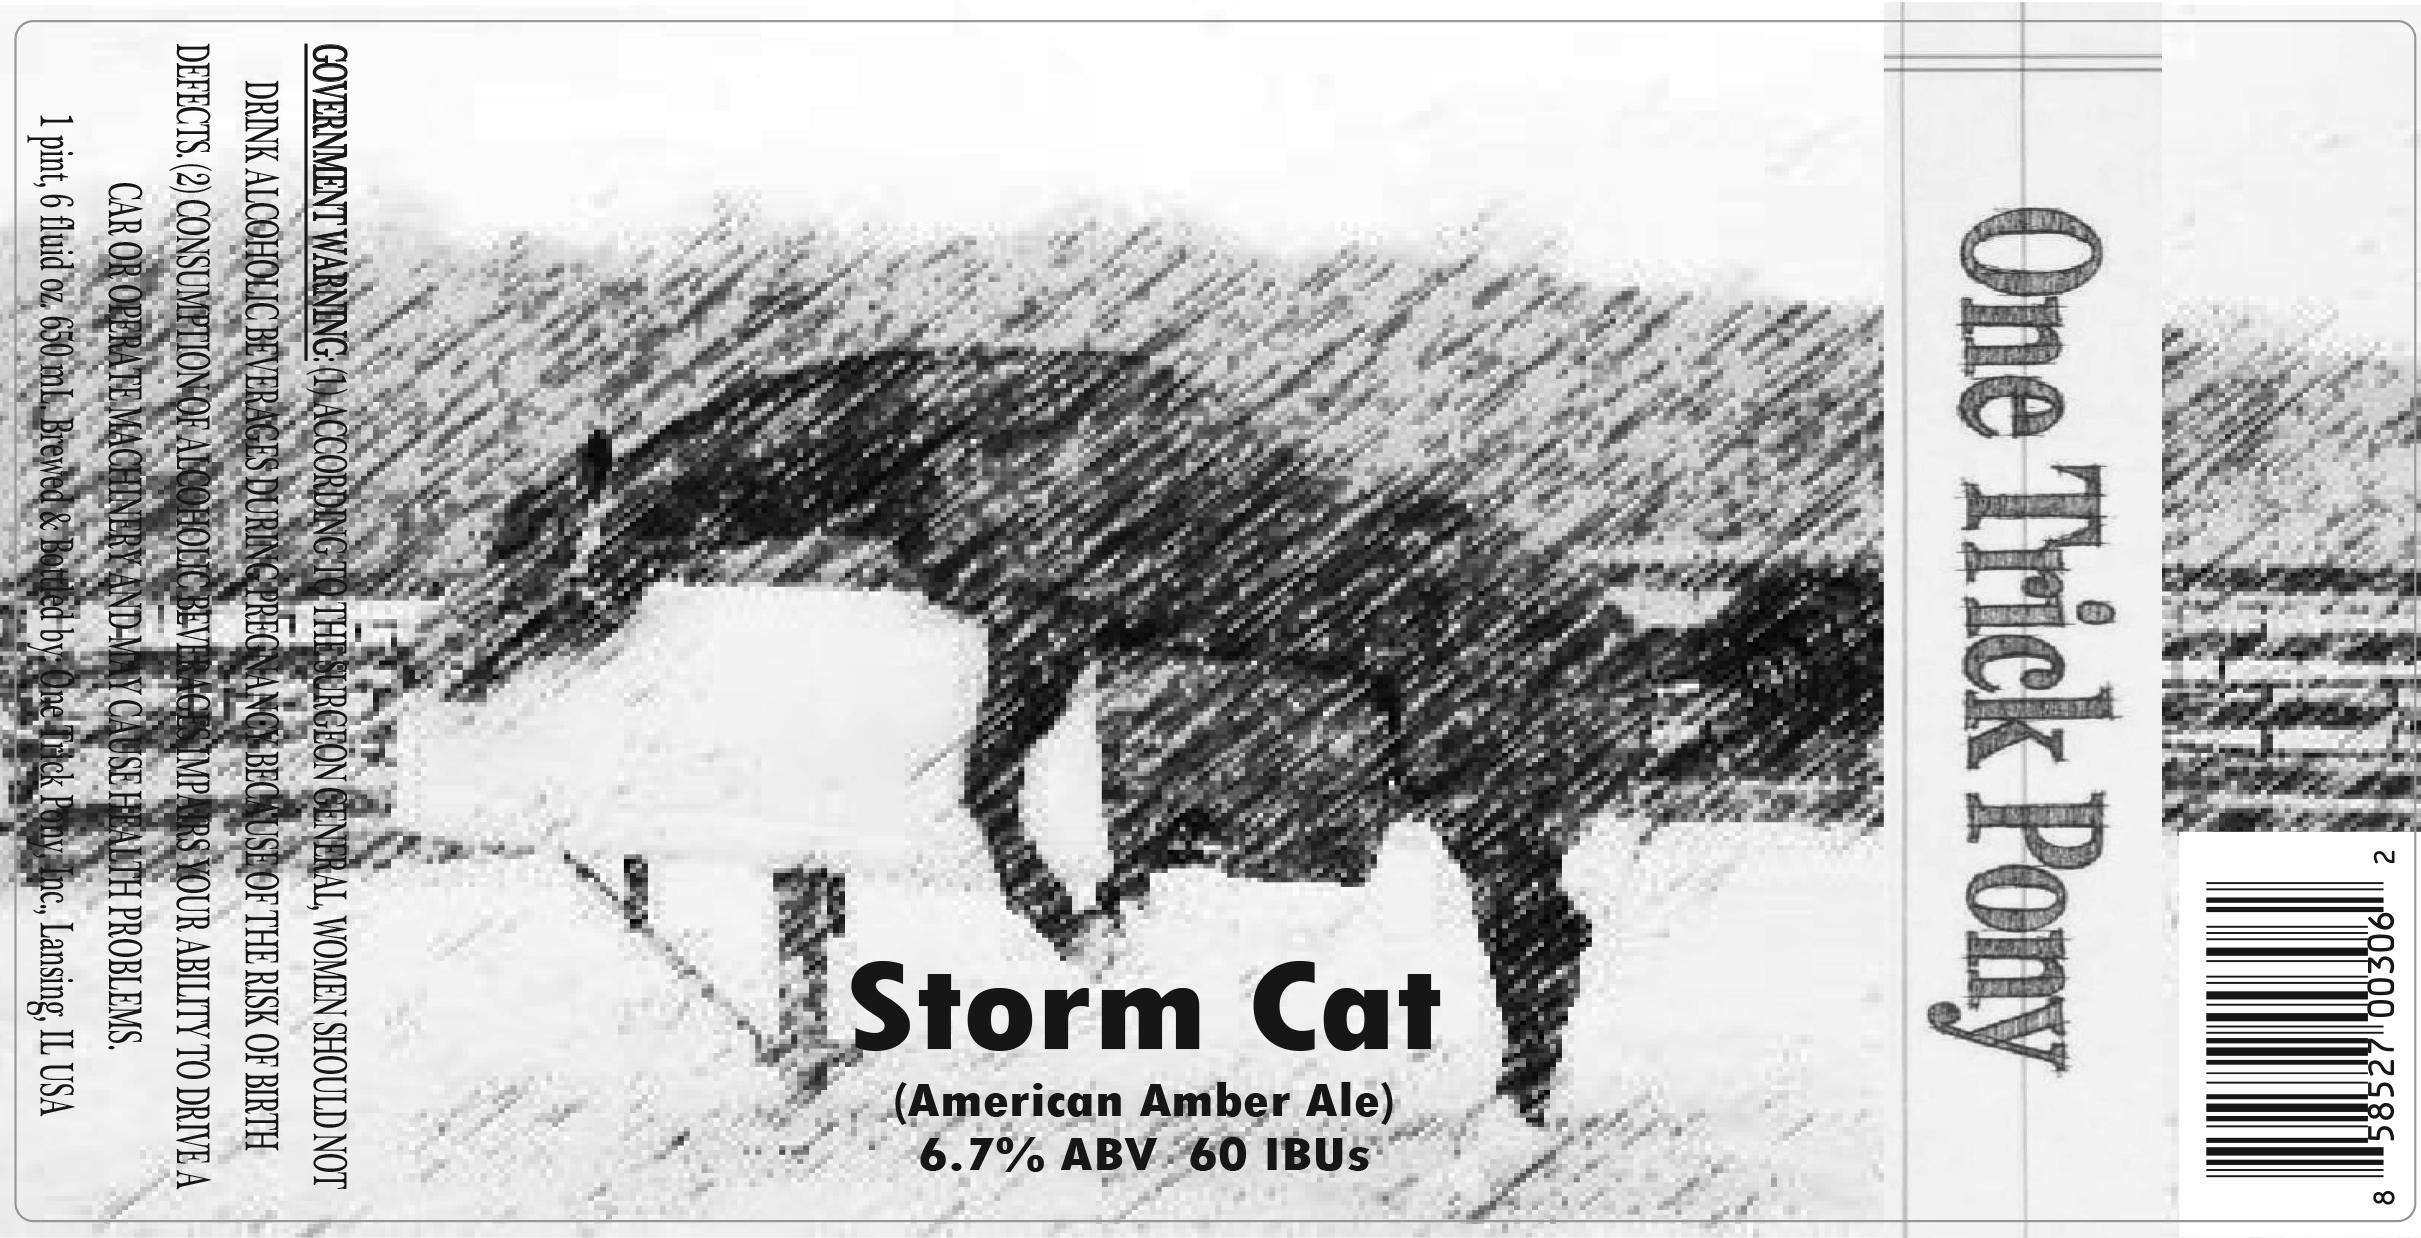 One Trick Pony Stormcat